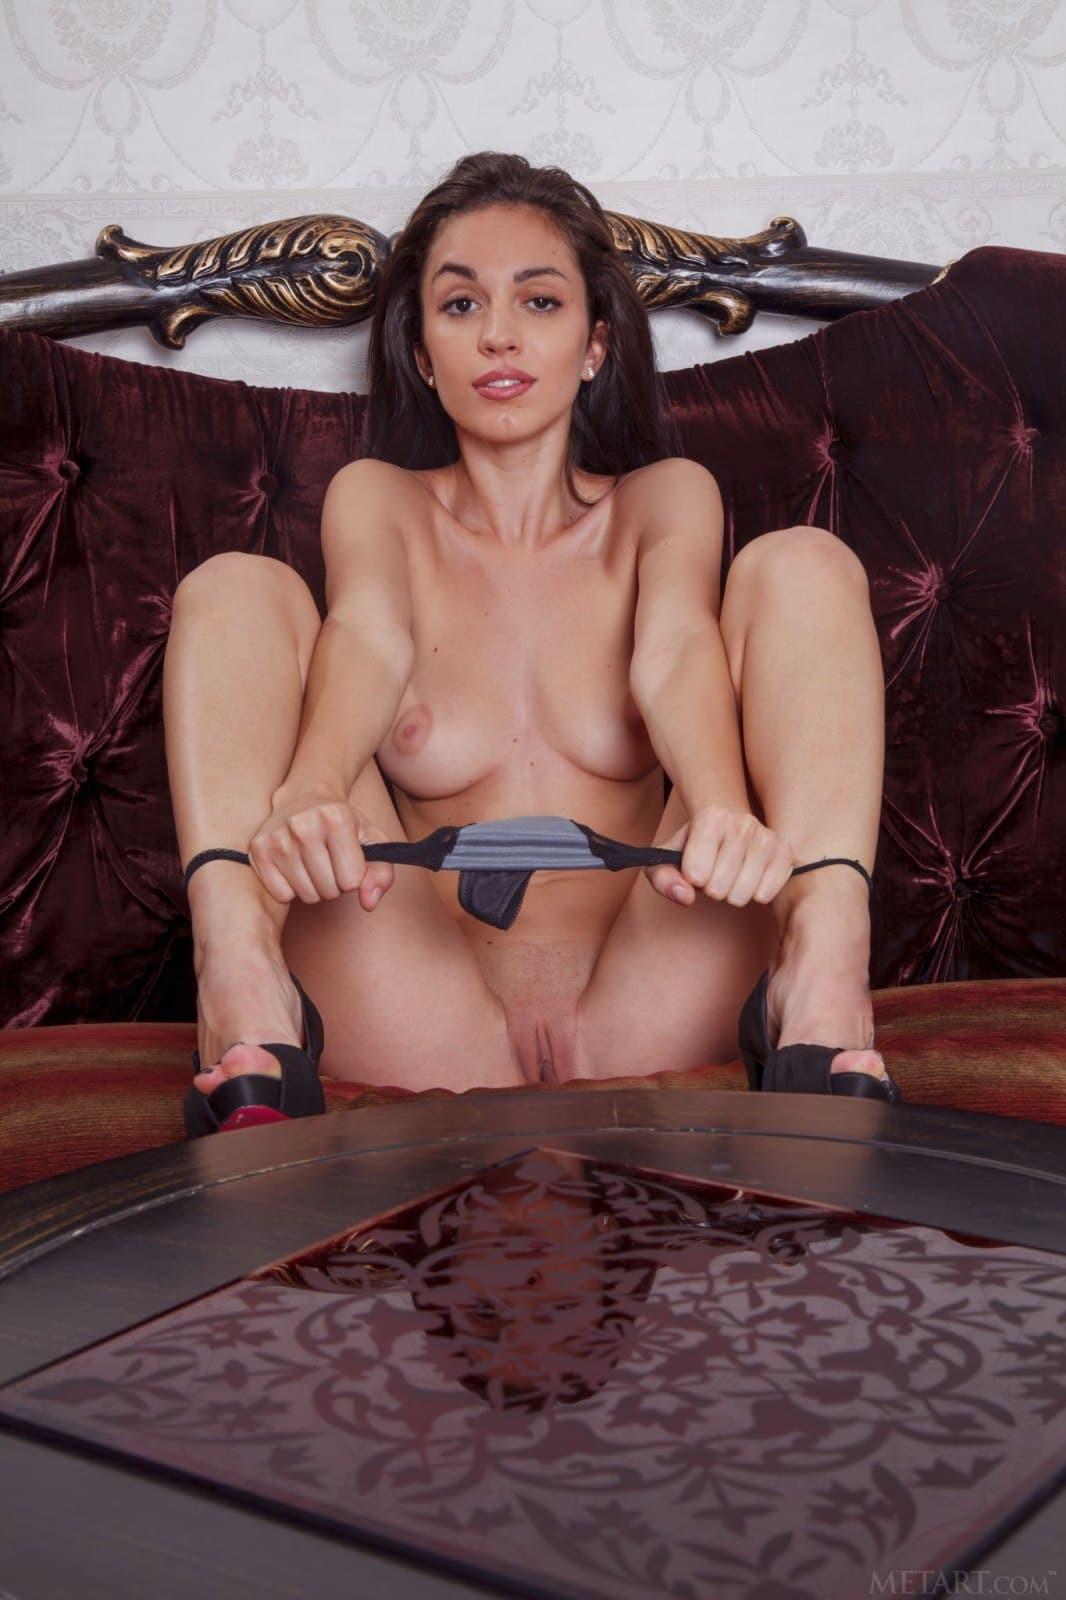 Раздетая девица с красивыми ногами на диване - фото